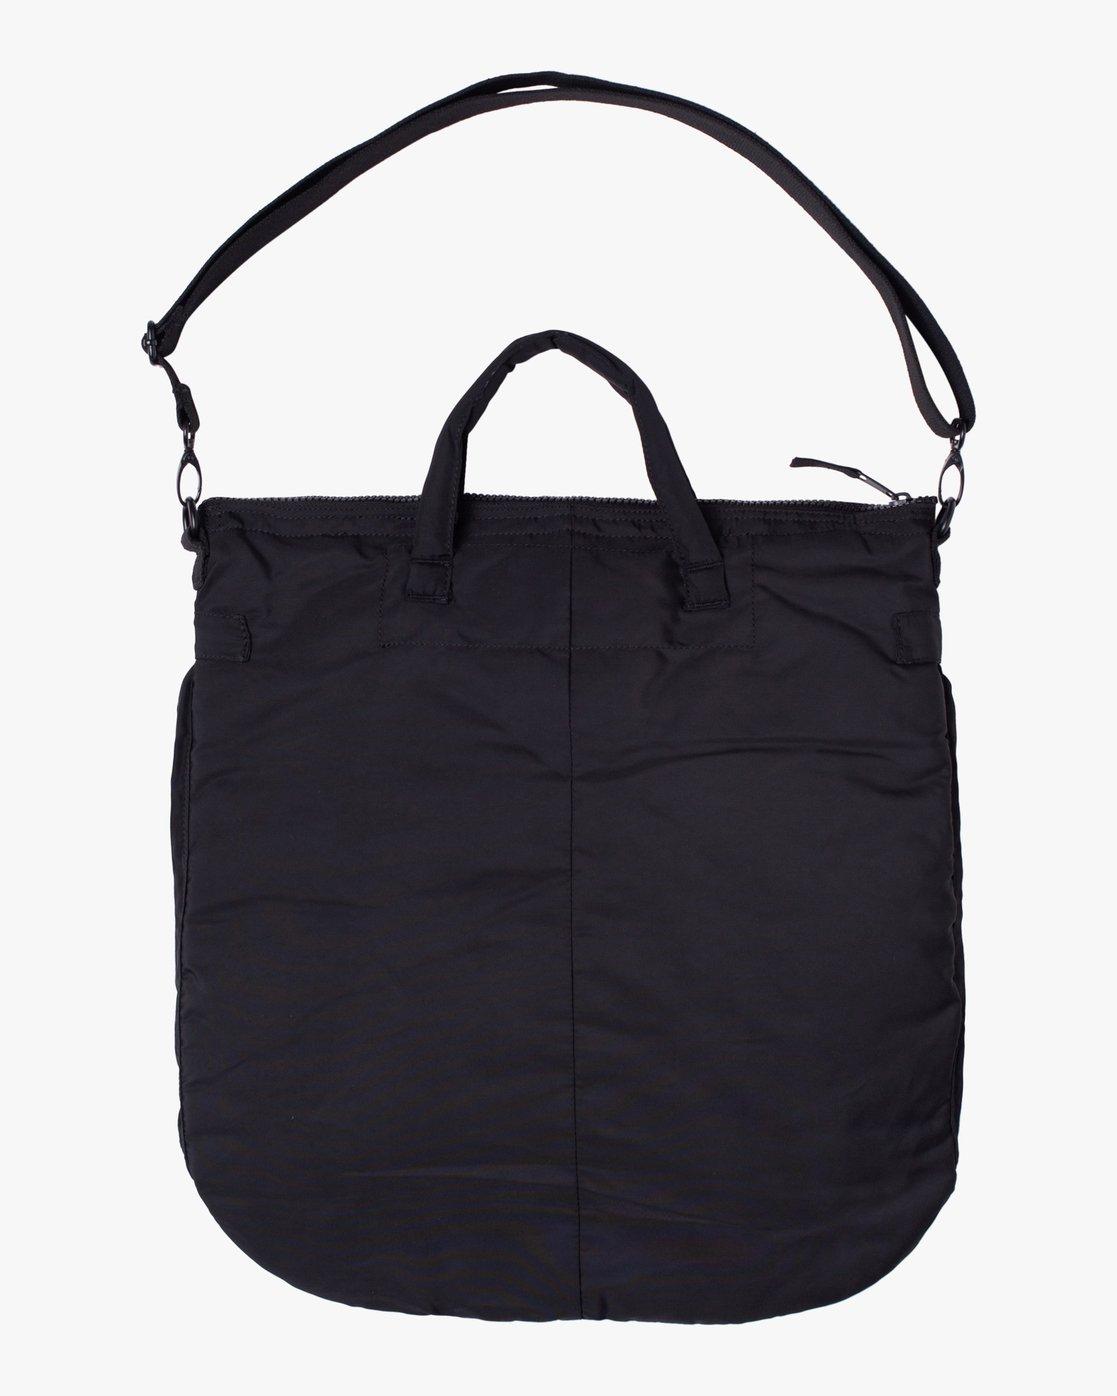 4 RVCA STANDARD TOTE BAG Black MABG2RST RVCA